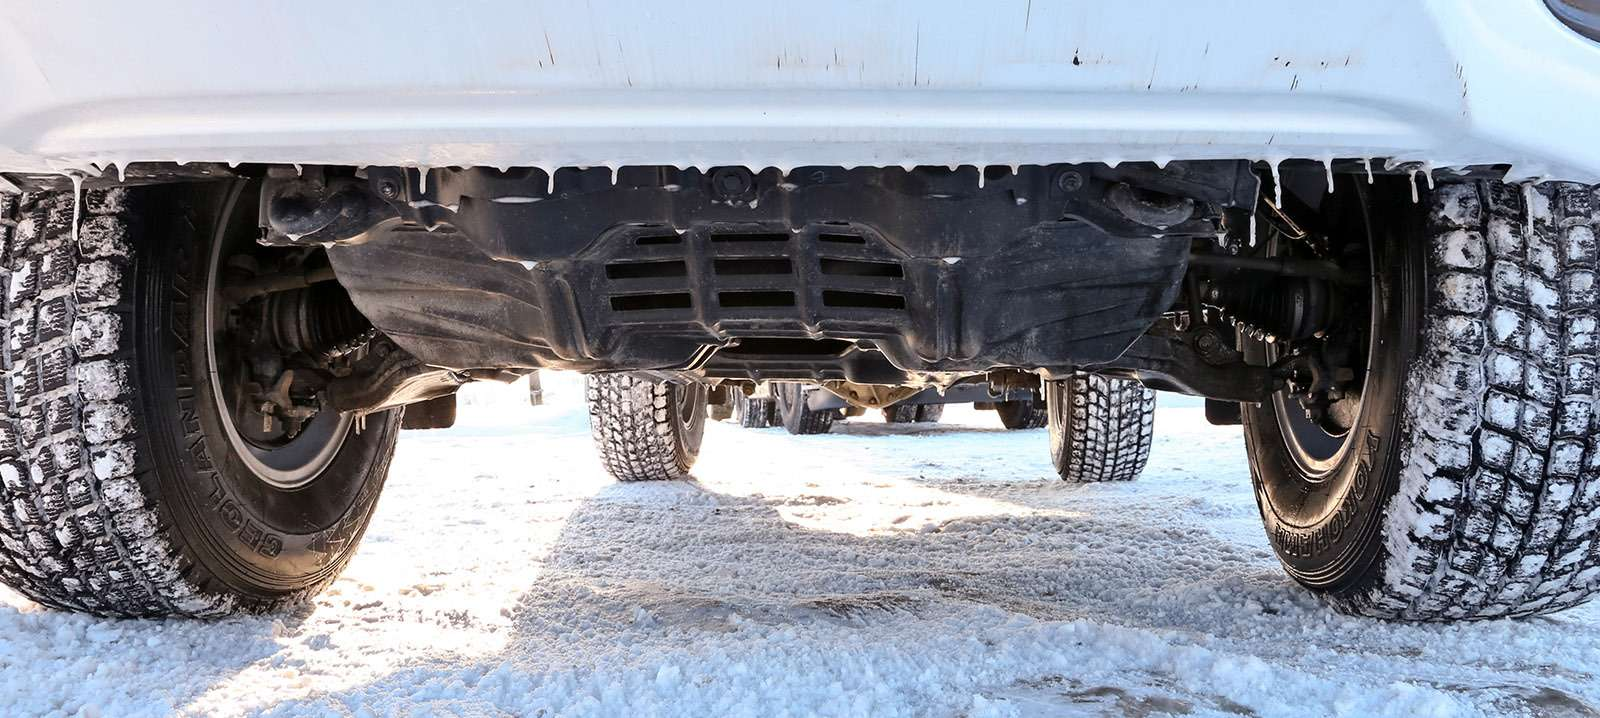 Пикапы Toyota Hilux Arctic Trucks: 4х4или 6х6?— фото 745684